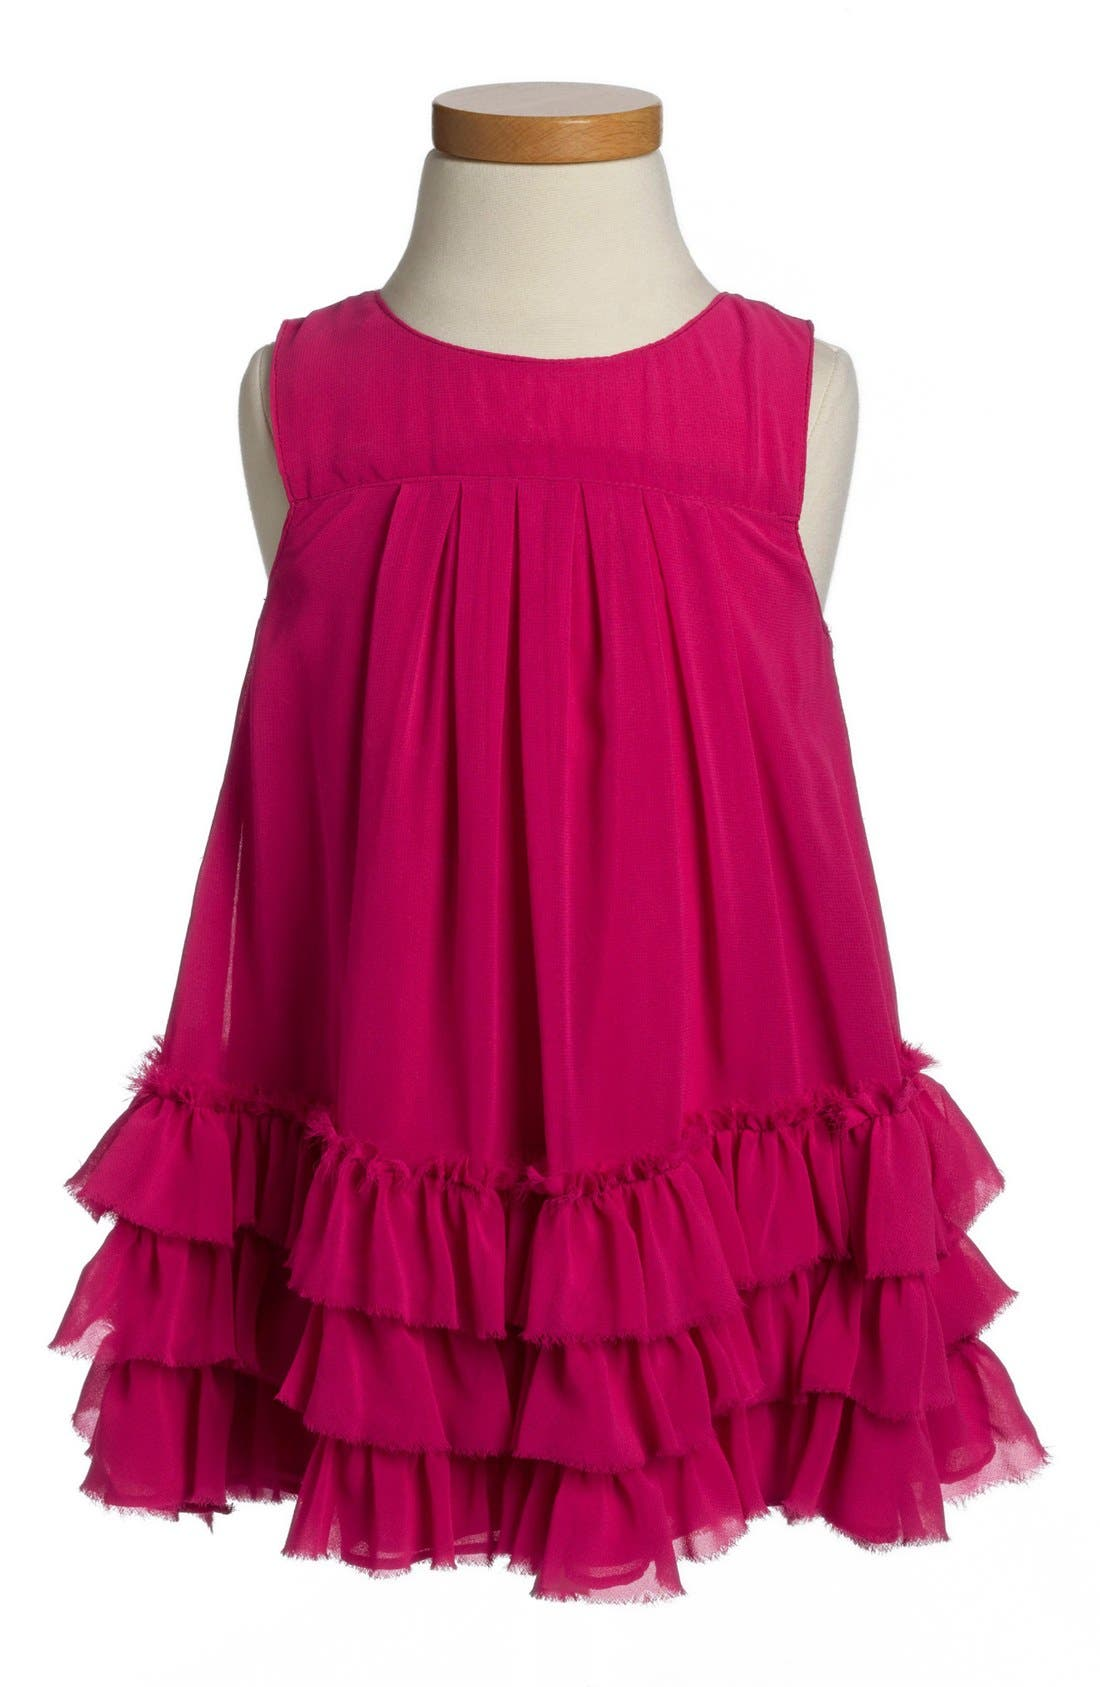 Alternate Image 1 Selected - Pippa & Julie Chiffon Dress (Toddler Girls)